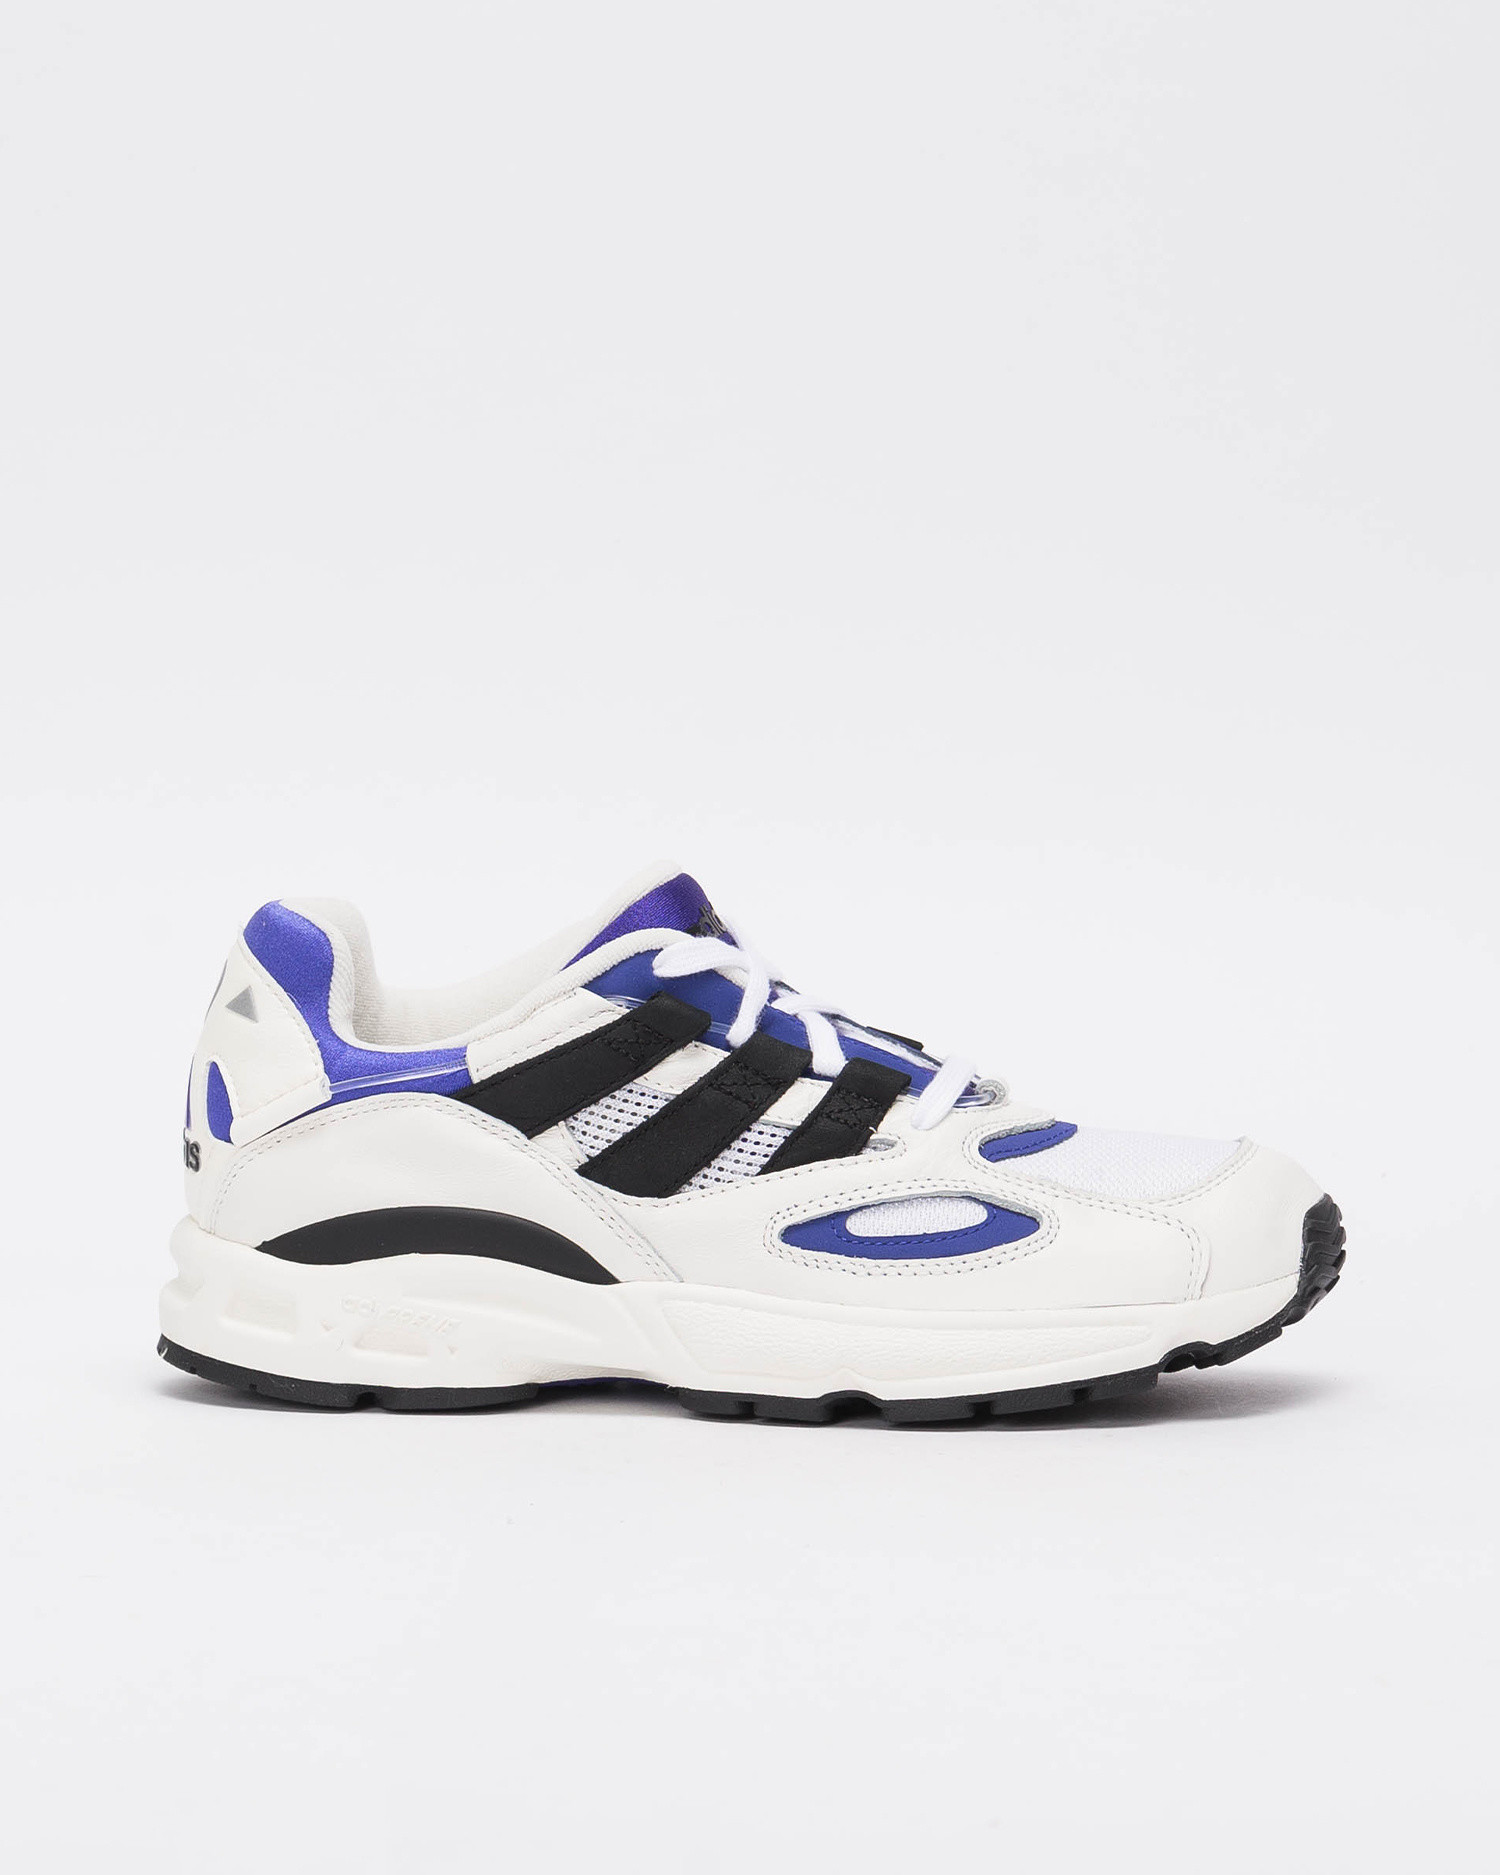 Adidas Lxcon 94 Ftw White/Core Black/Energy Ink